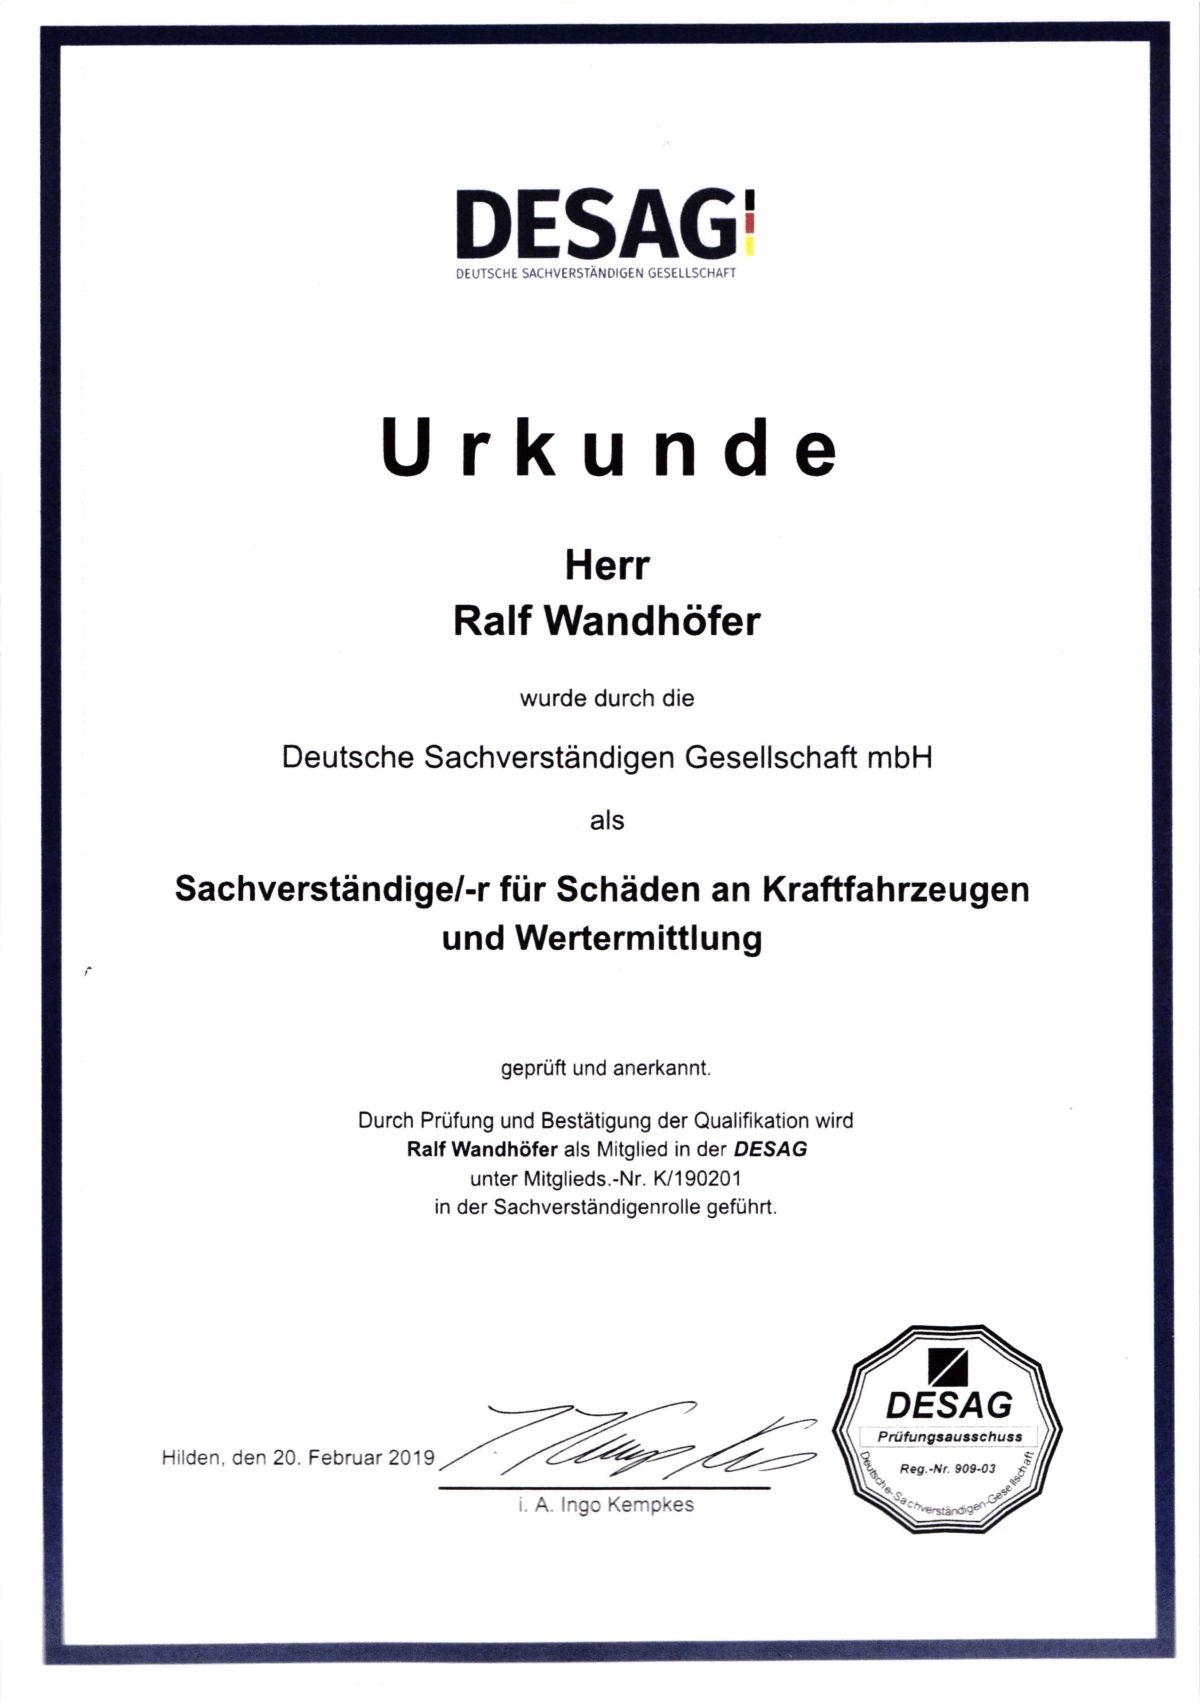 Ralf_Wandhöfer_Zertifikat_010